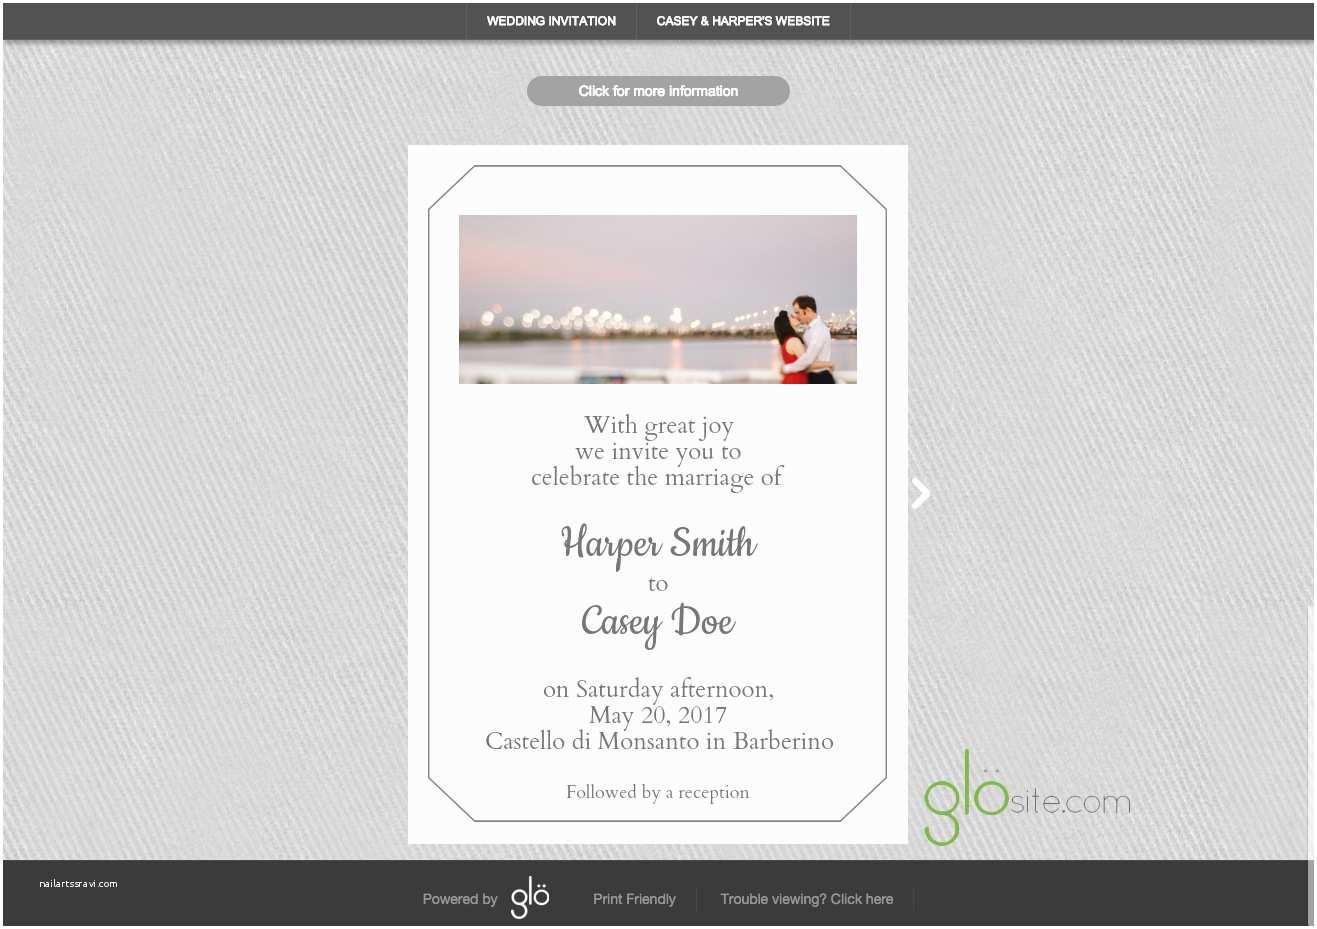 Wedding Invitation Email Unique Wedding Invitations Email – Wedding Invitation Design